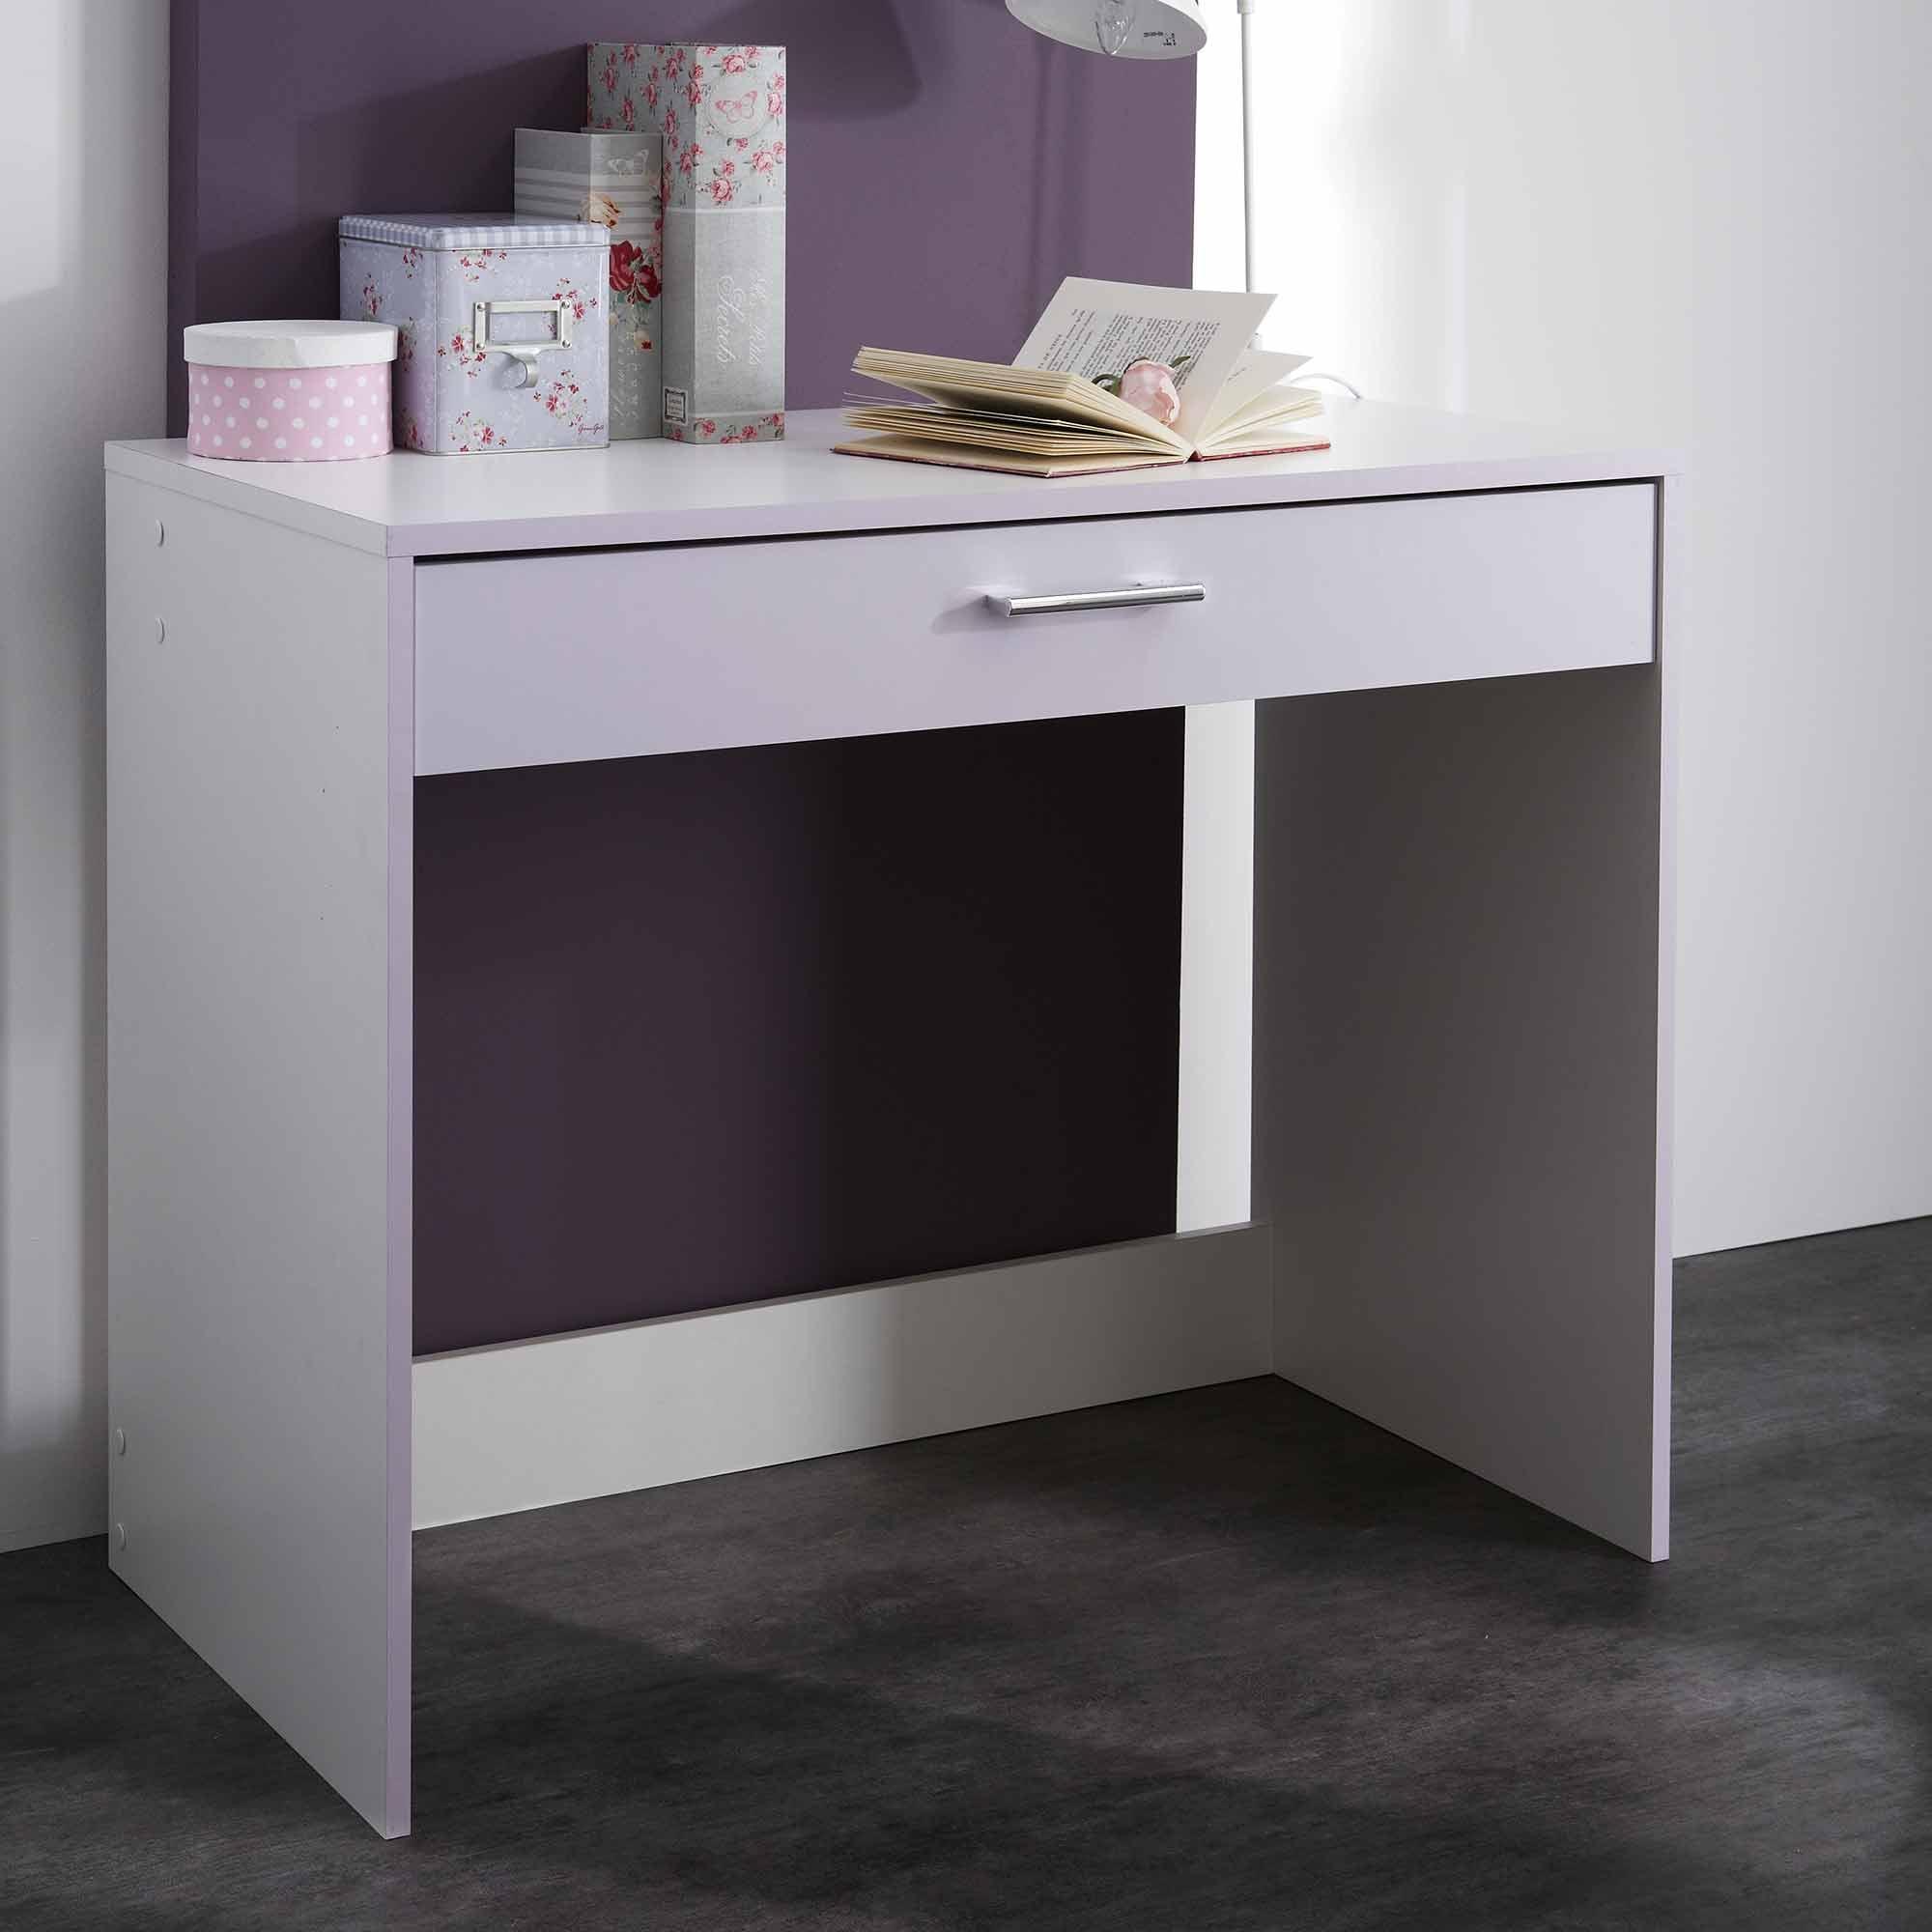 bureau fille blanc et parme mina. Black Bedroom Furniture Sets. Home Design Ideas